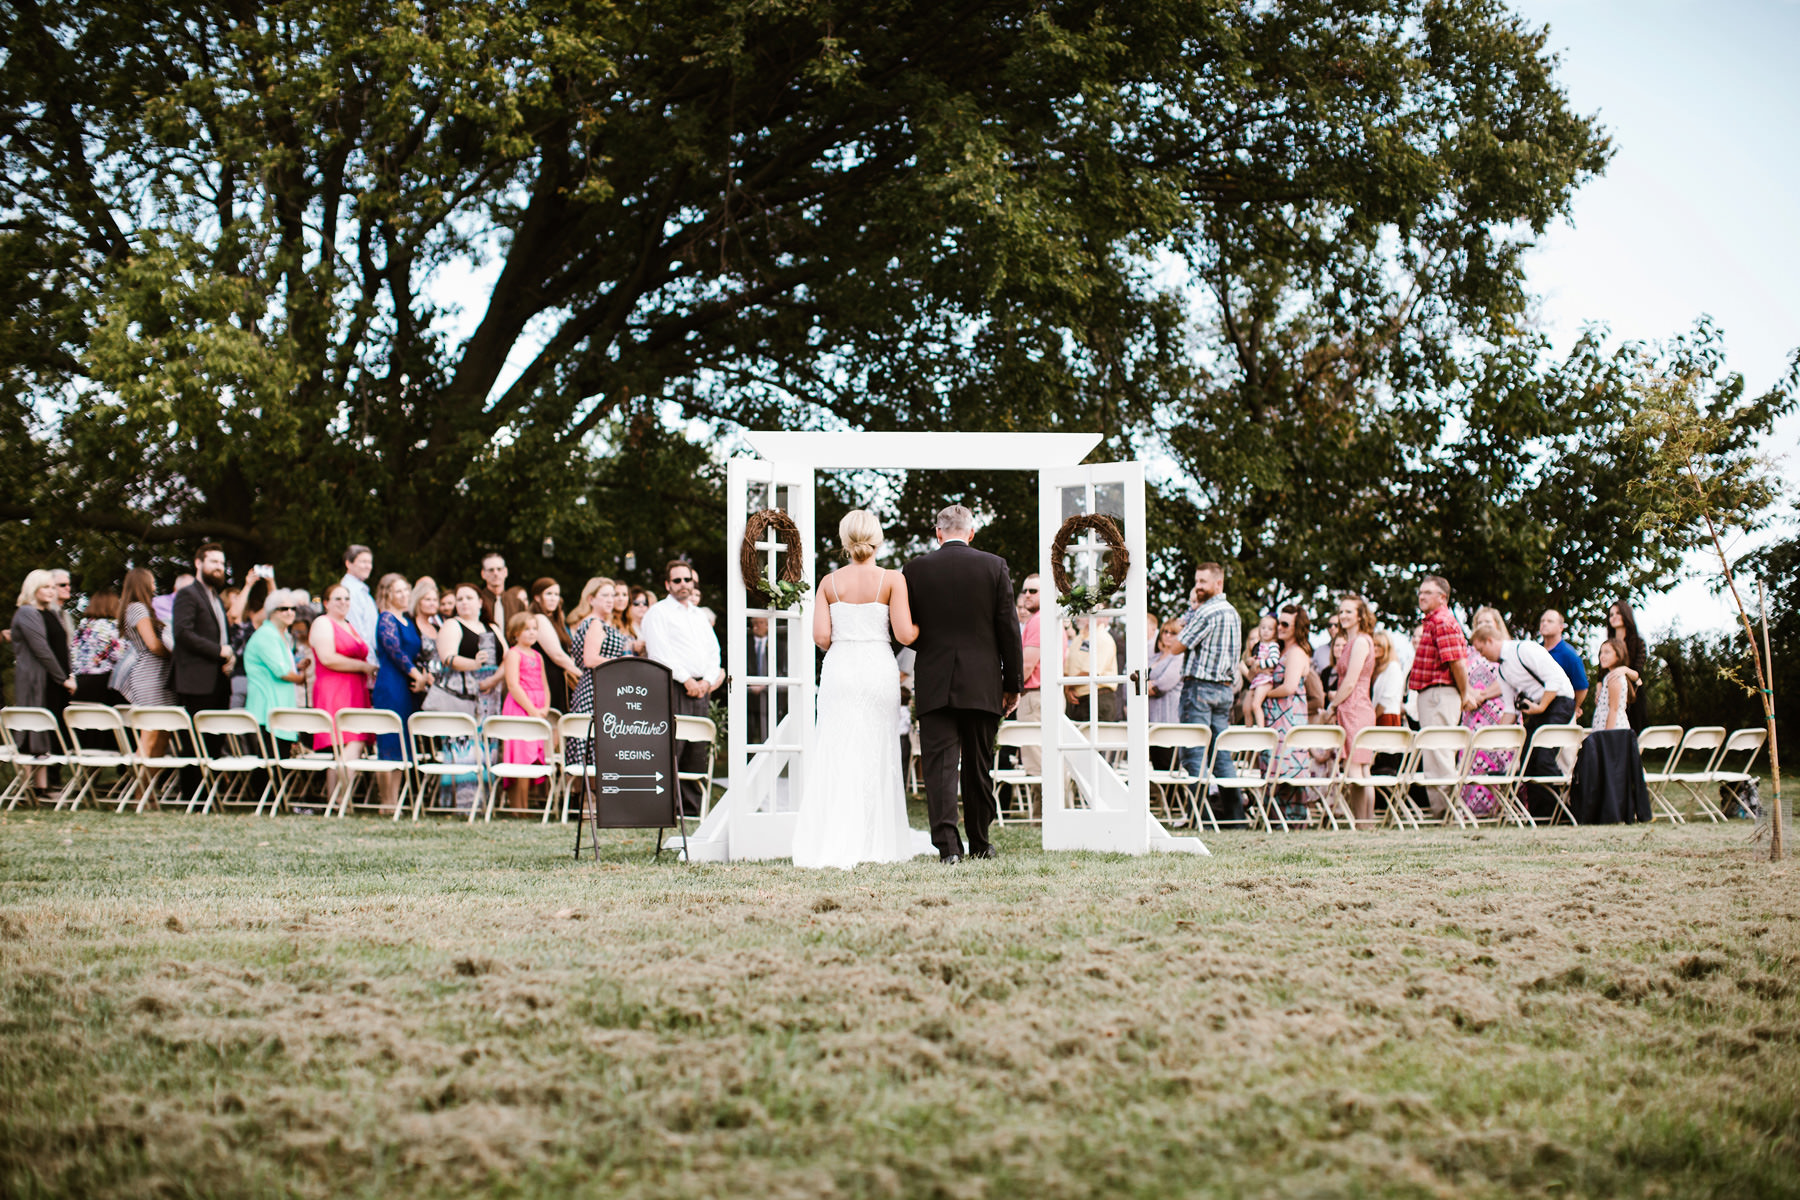 Alldredge Orchard Kansas City_Kindling Wedding Photography BLOG 40.JPG